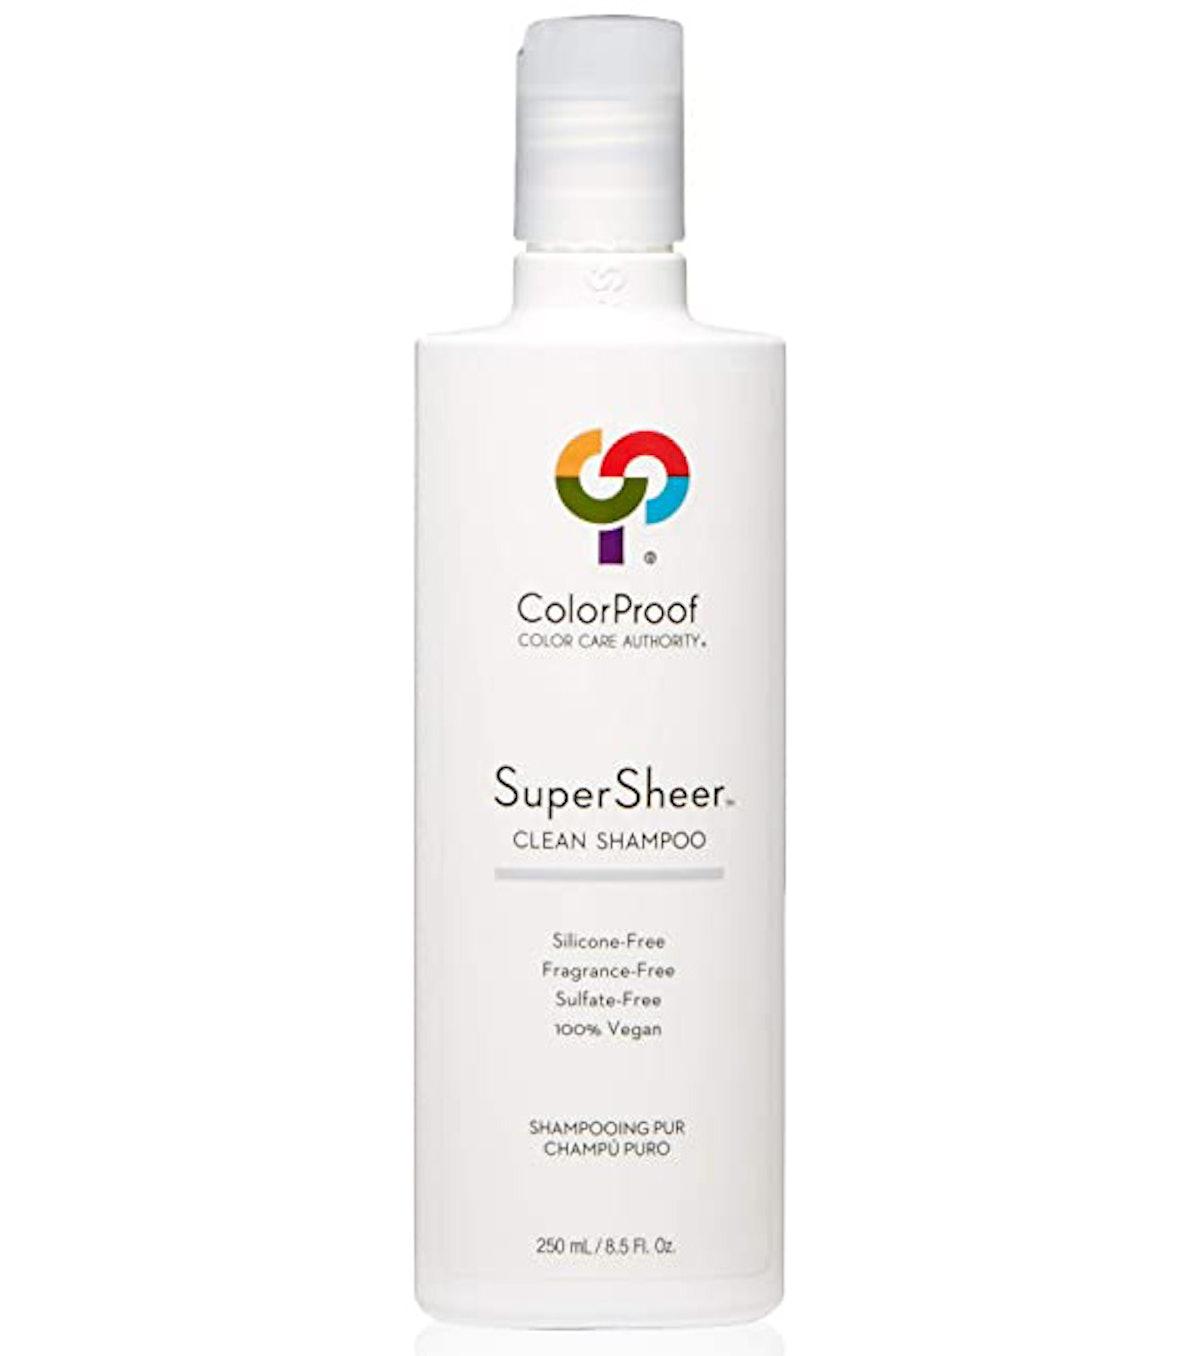 ColorProof SuperSheer Clean Shampoo